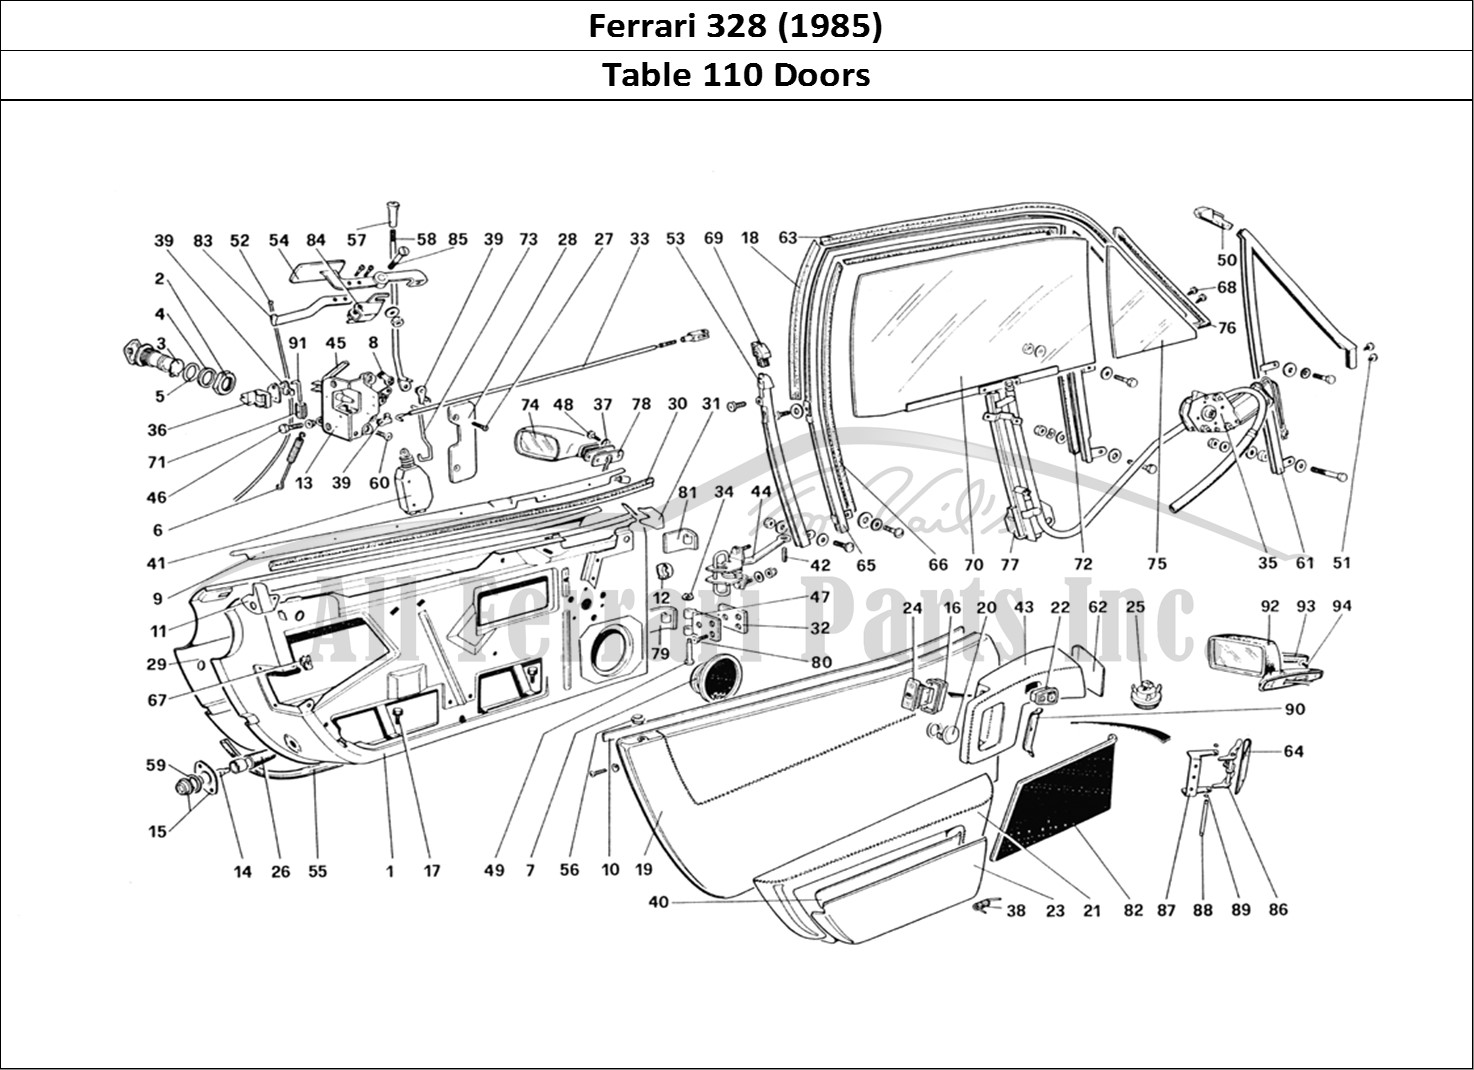 Buy original Ferrari 328 (1985) 110 Doors Ferrari parts